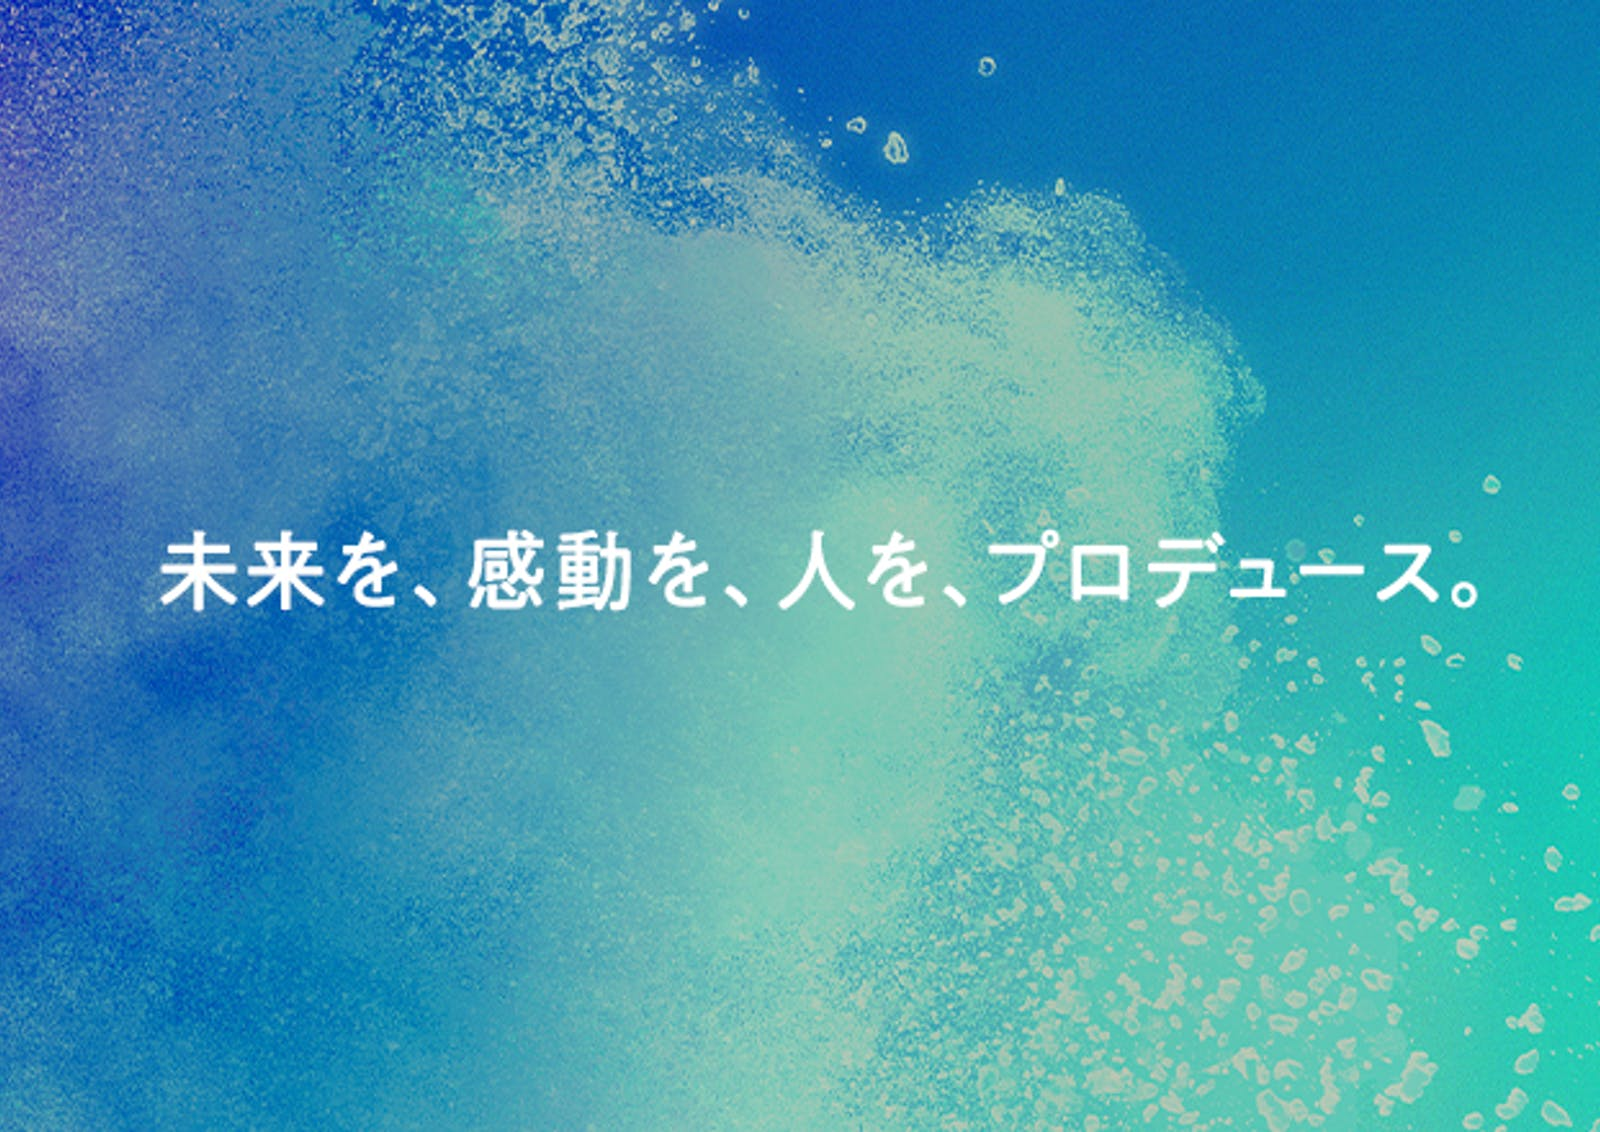 AOI TYO Holdings株式会社のアイキャッチ画像